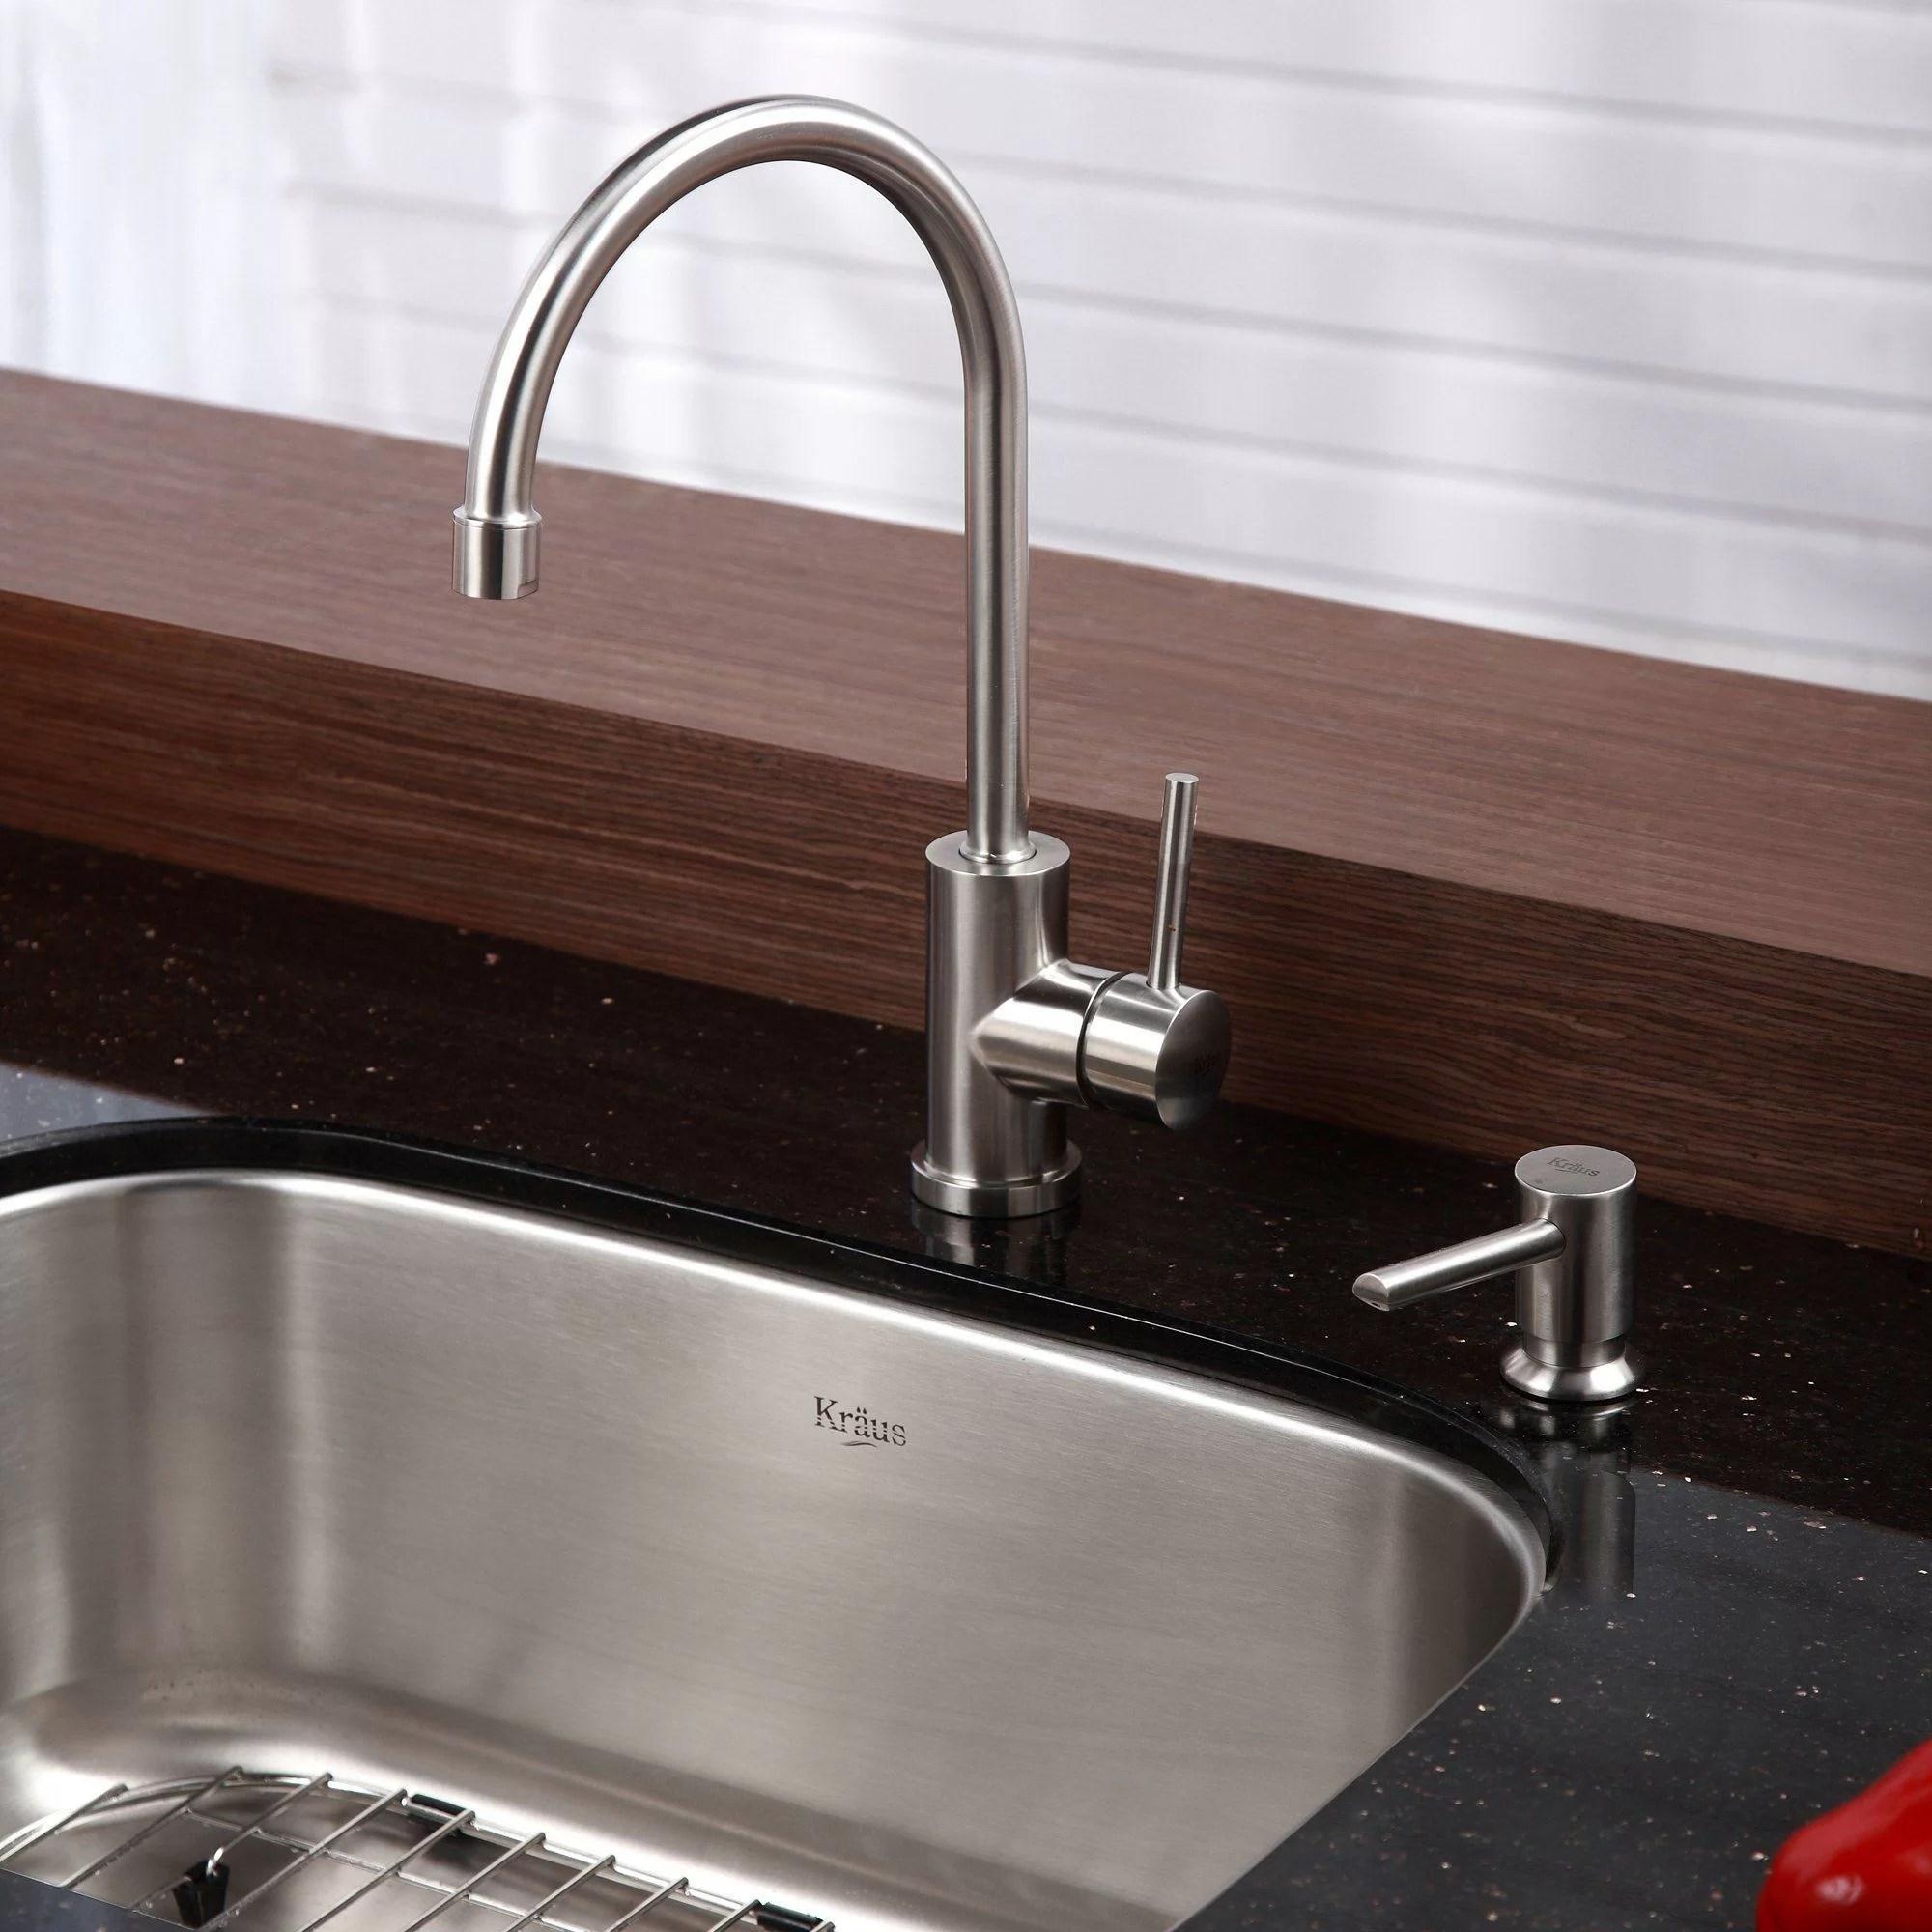 undermount stainless sinks kitchen aid costco kraus steel 23 quot x 17 6 single bowl